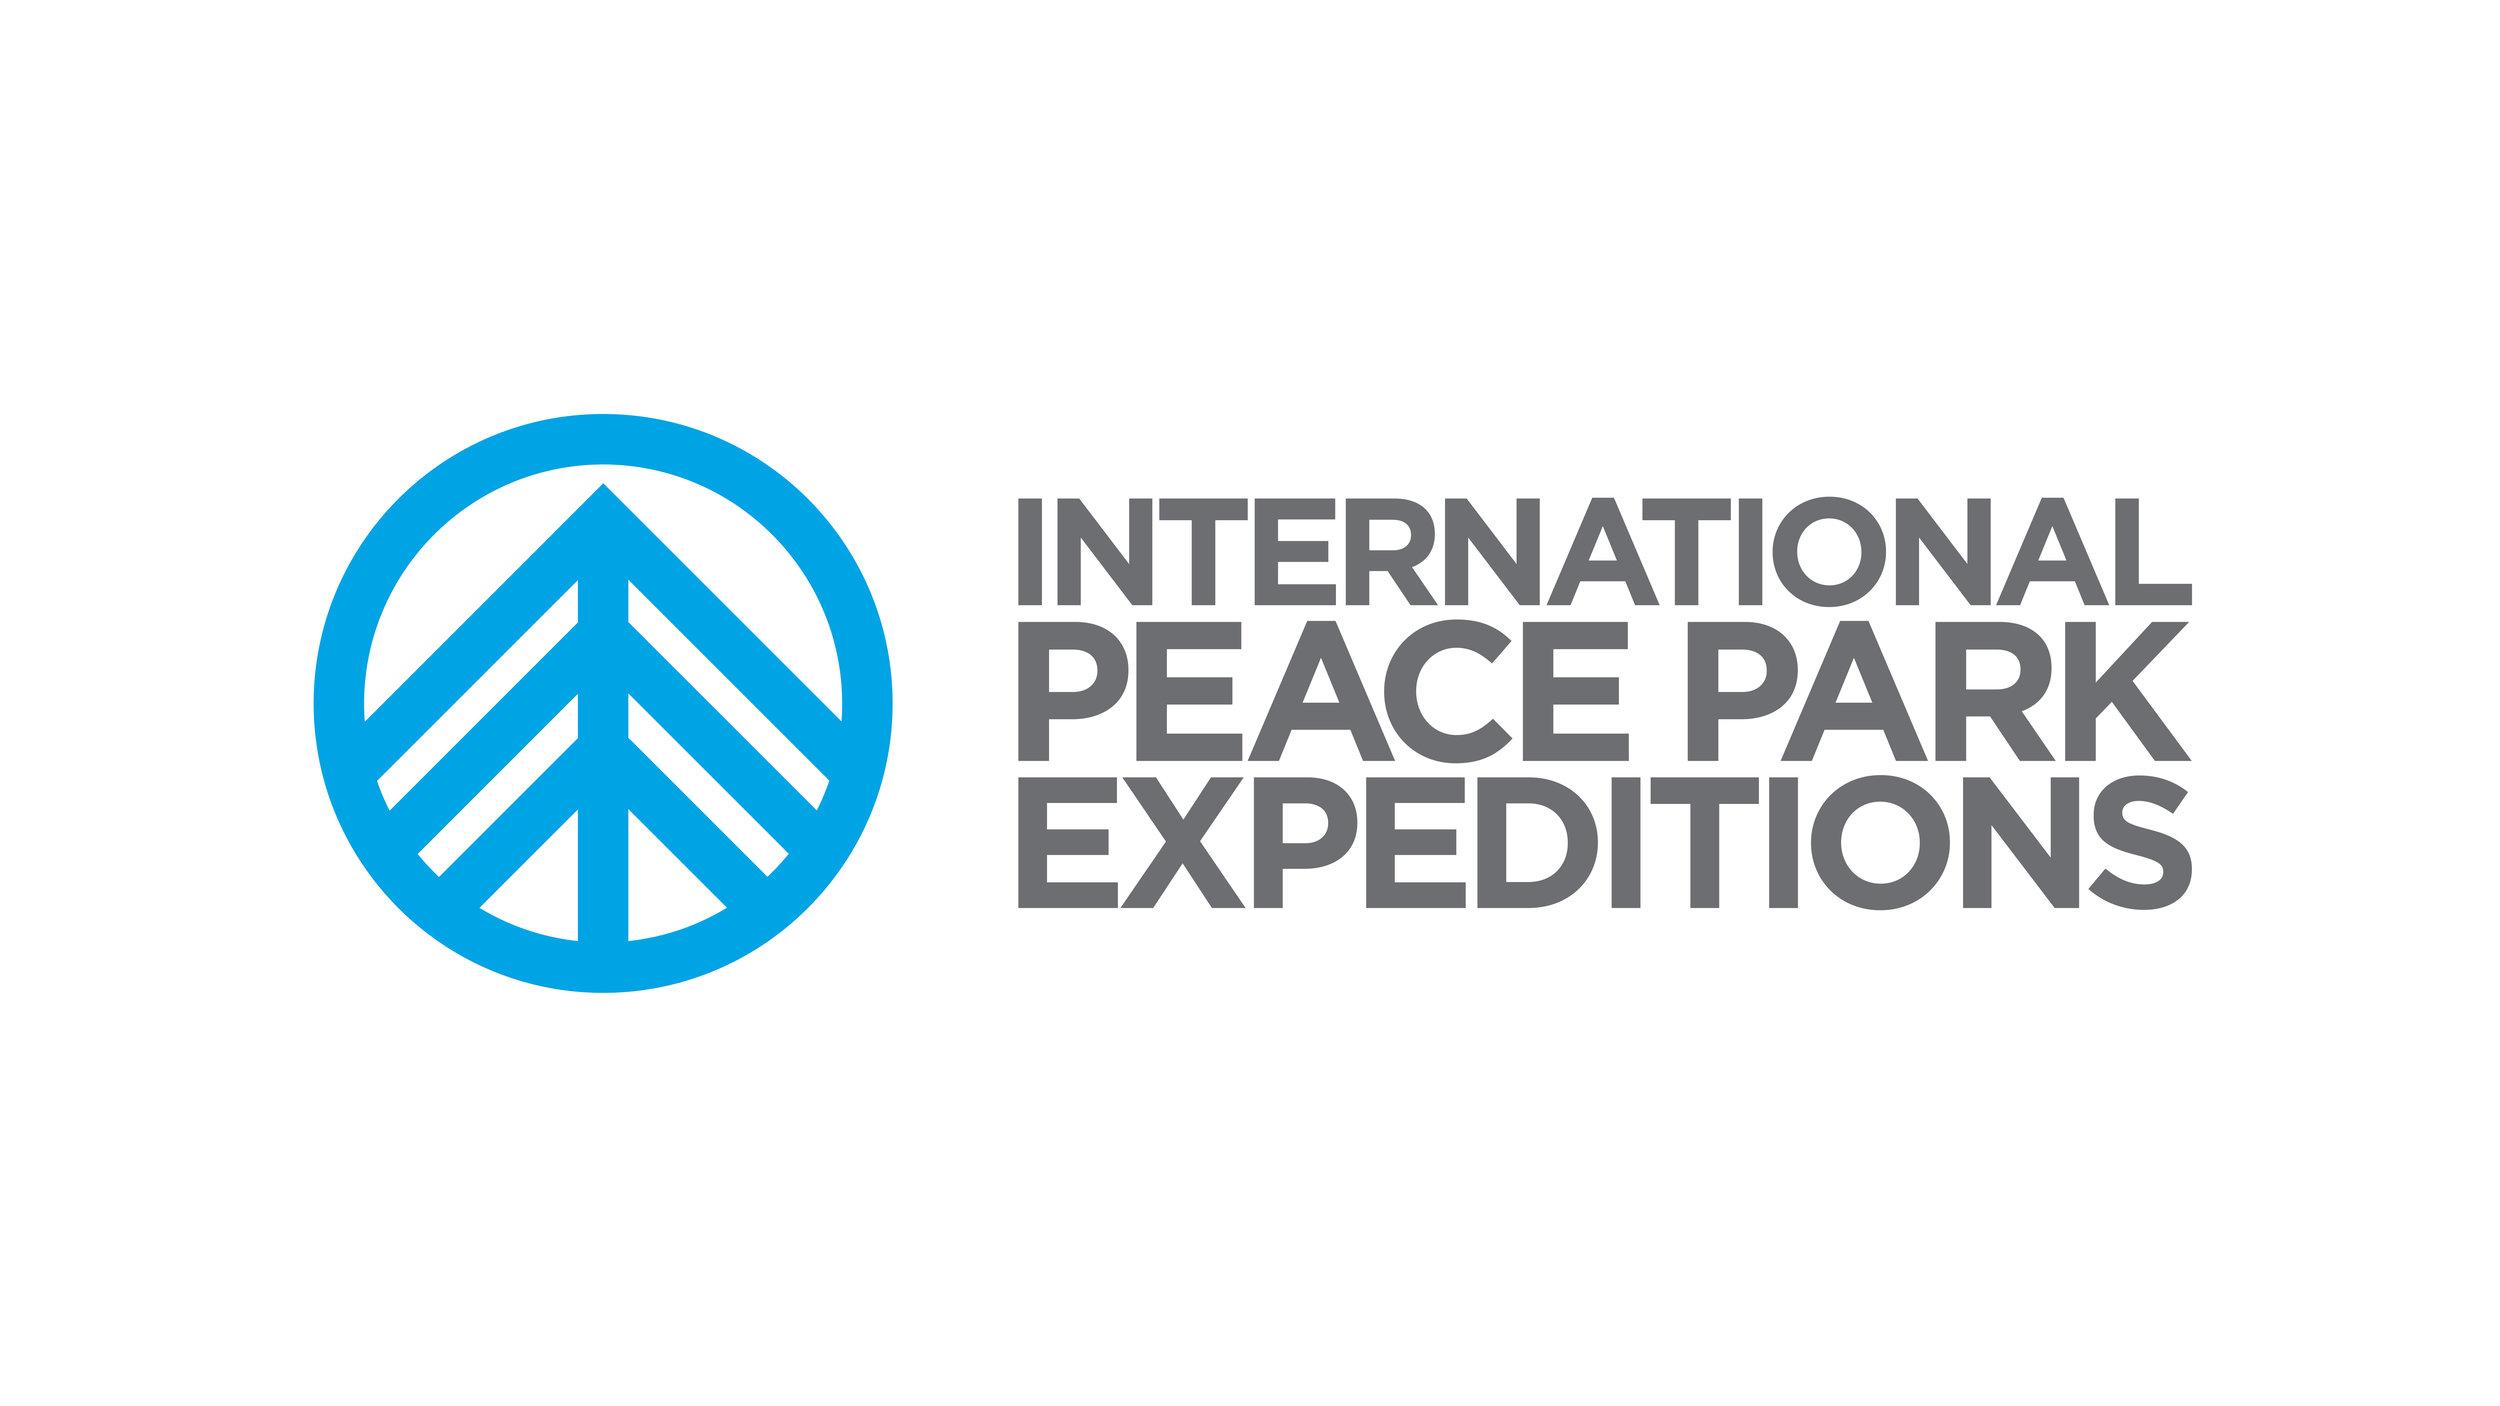 Primary Logo (Horizontal)